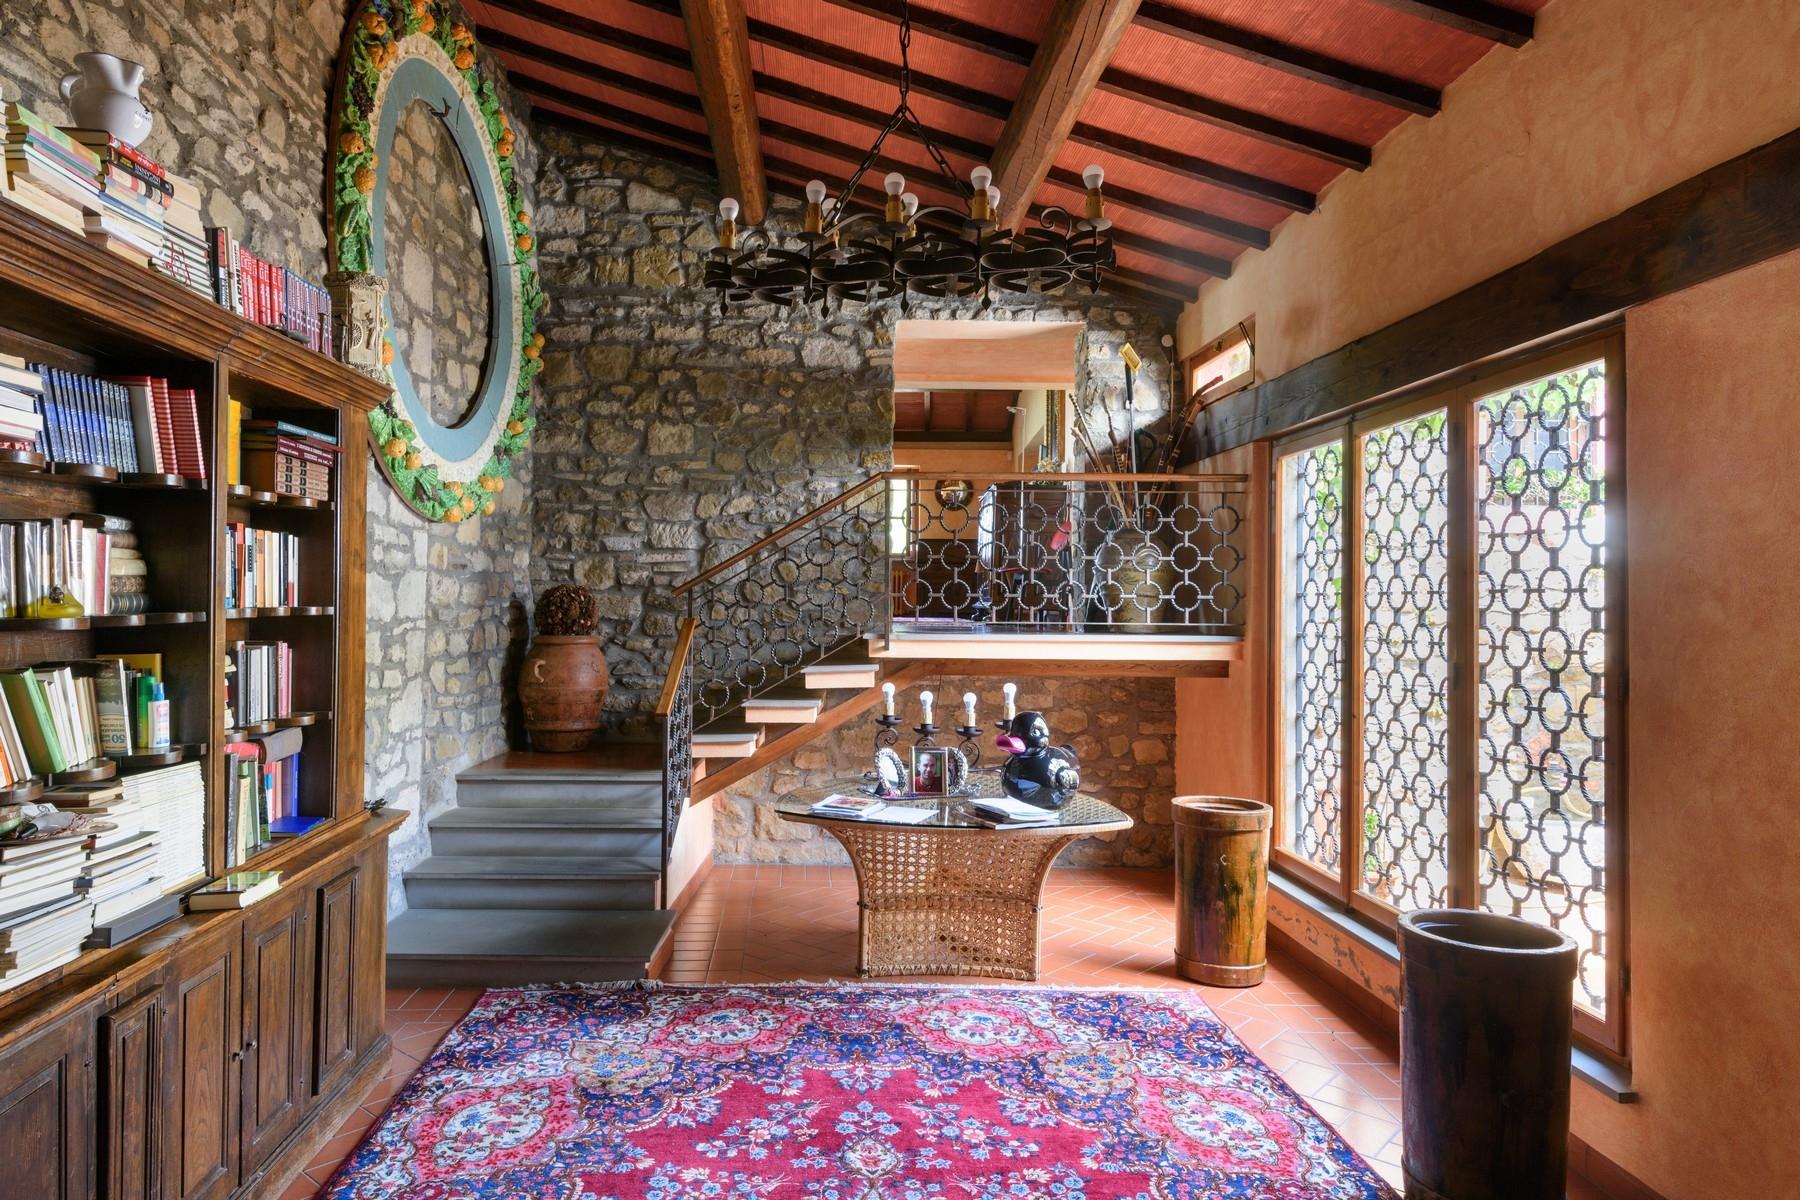 Villa in Vendita a Greve In Chianti: 5 locali, 491 mq - Foto 4